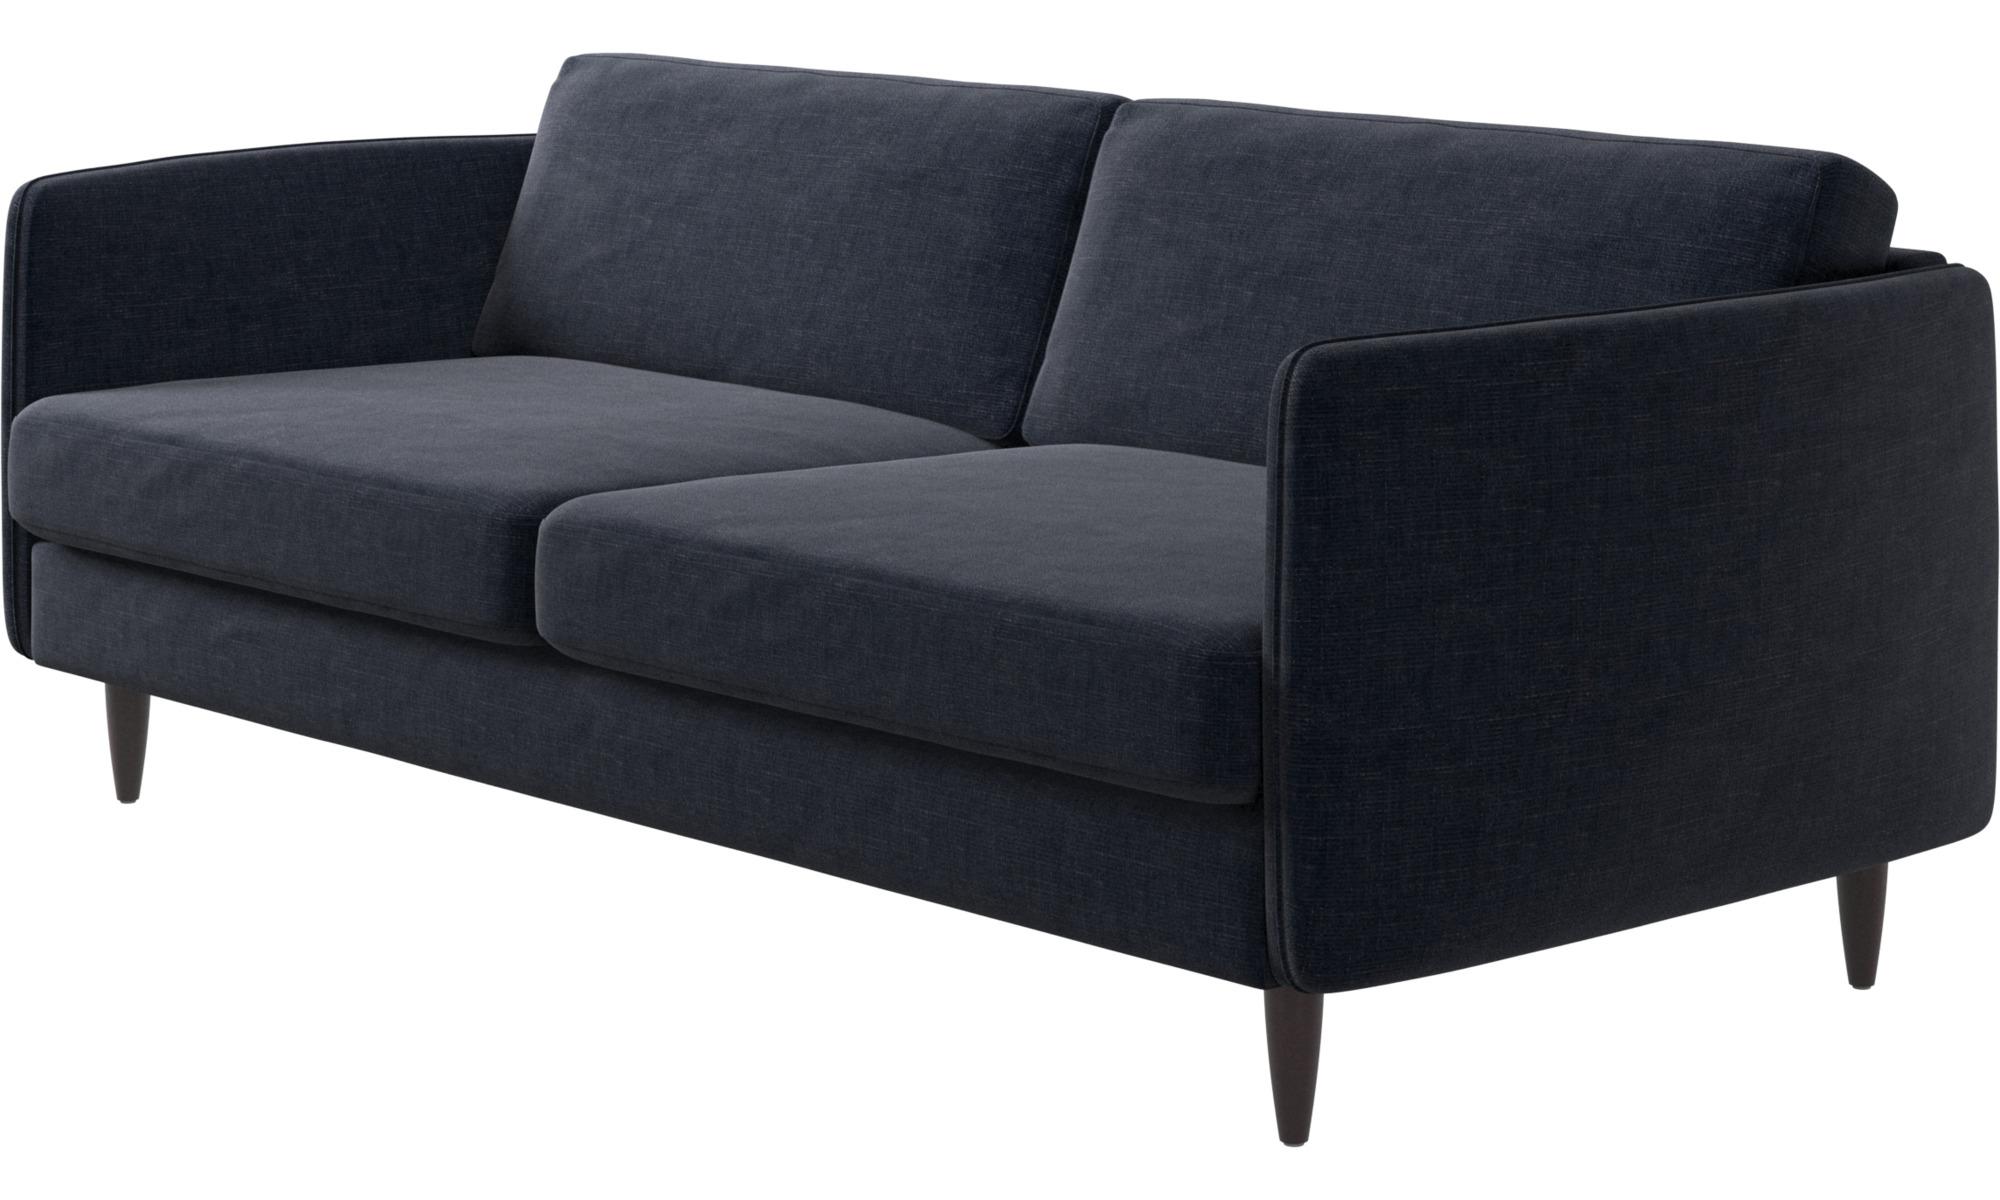 une touche de sophistication canap osaka assise. Black Bedroom Furniture Sets. Home Design Ideas